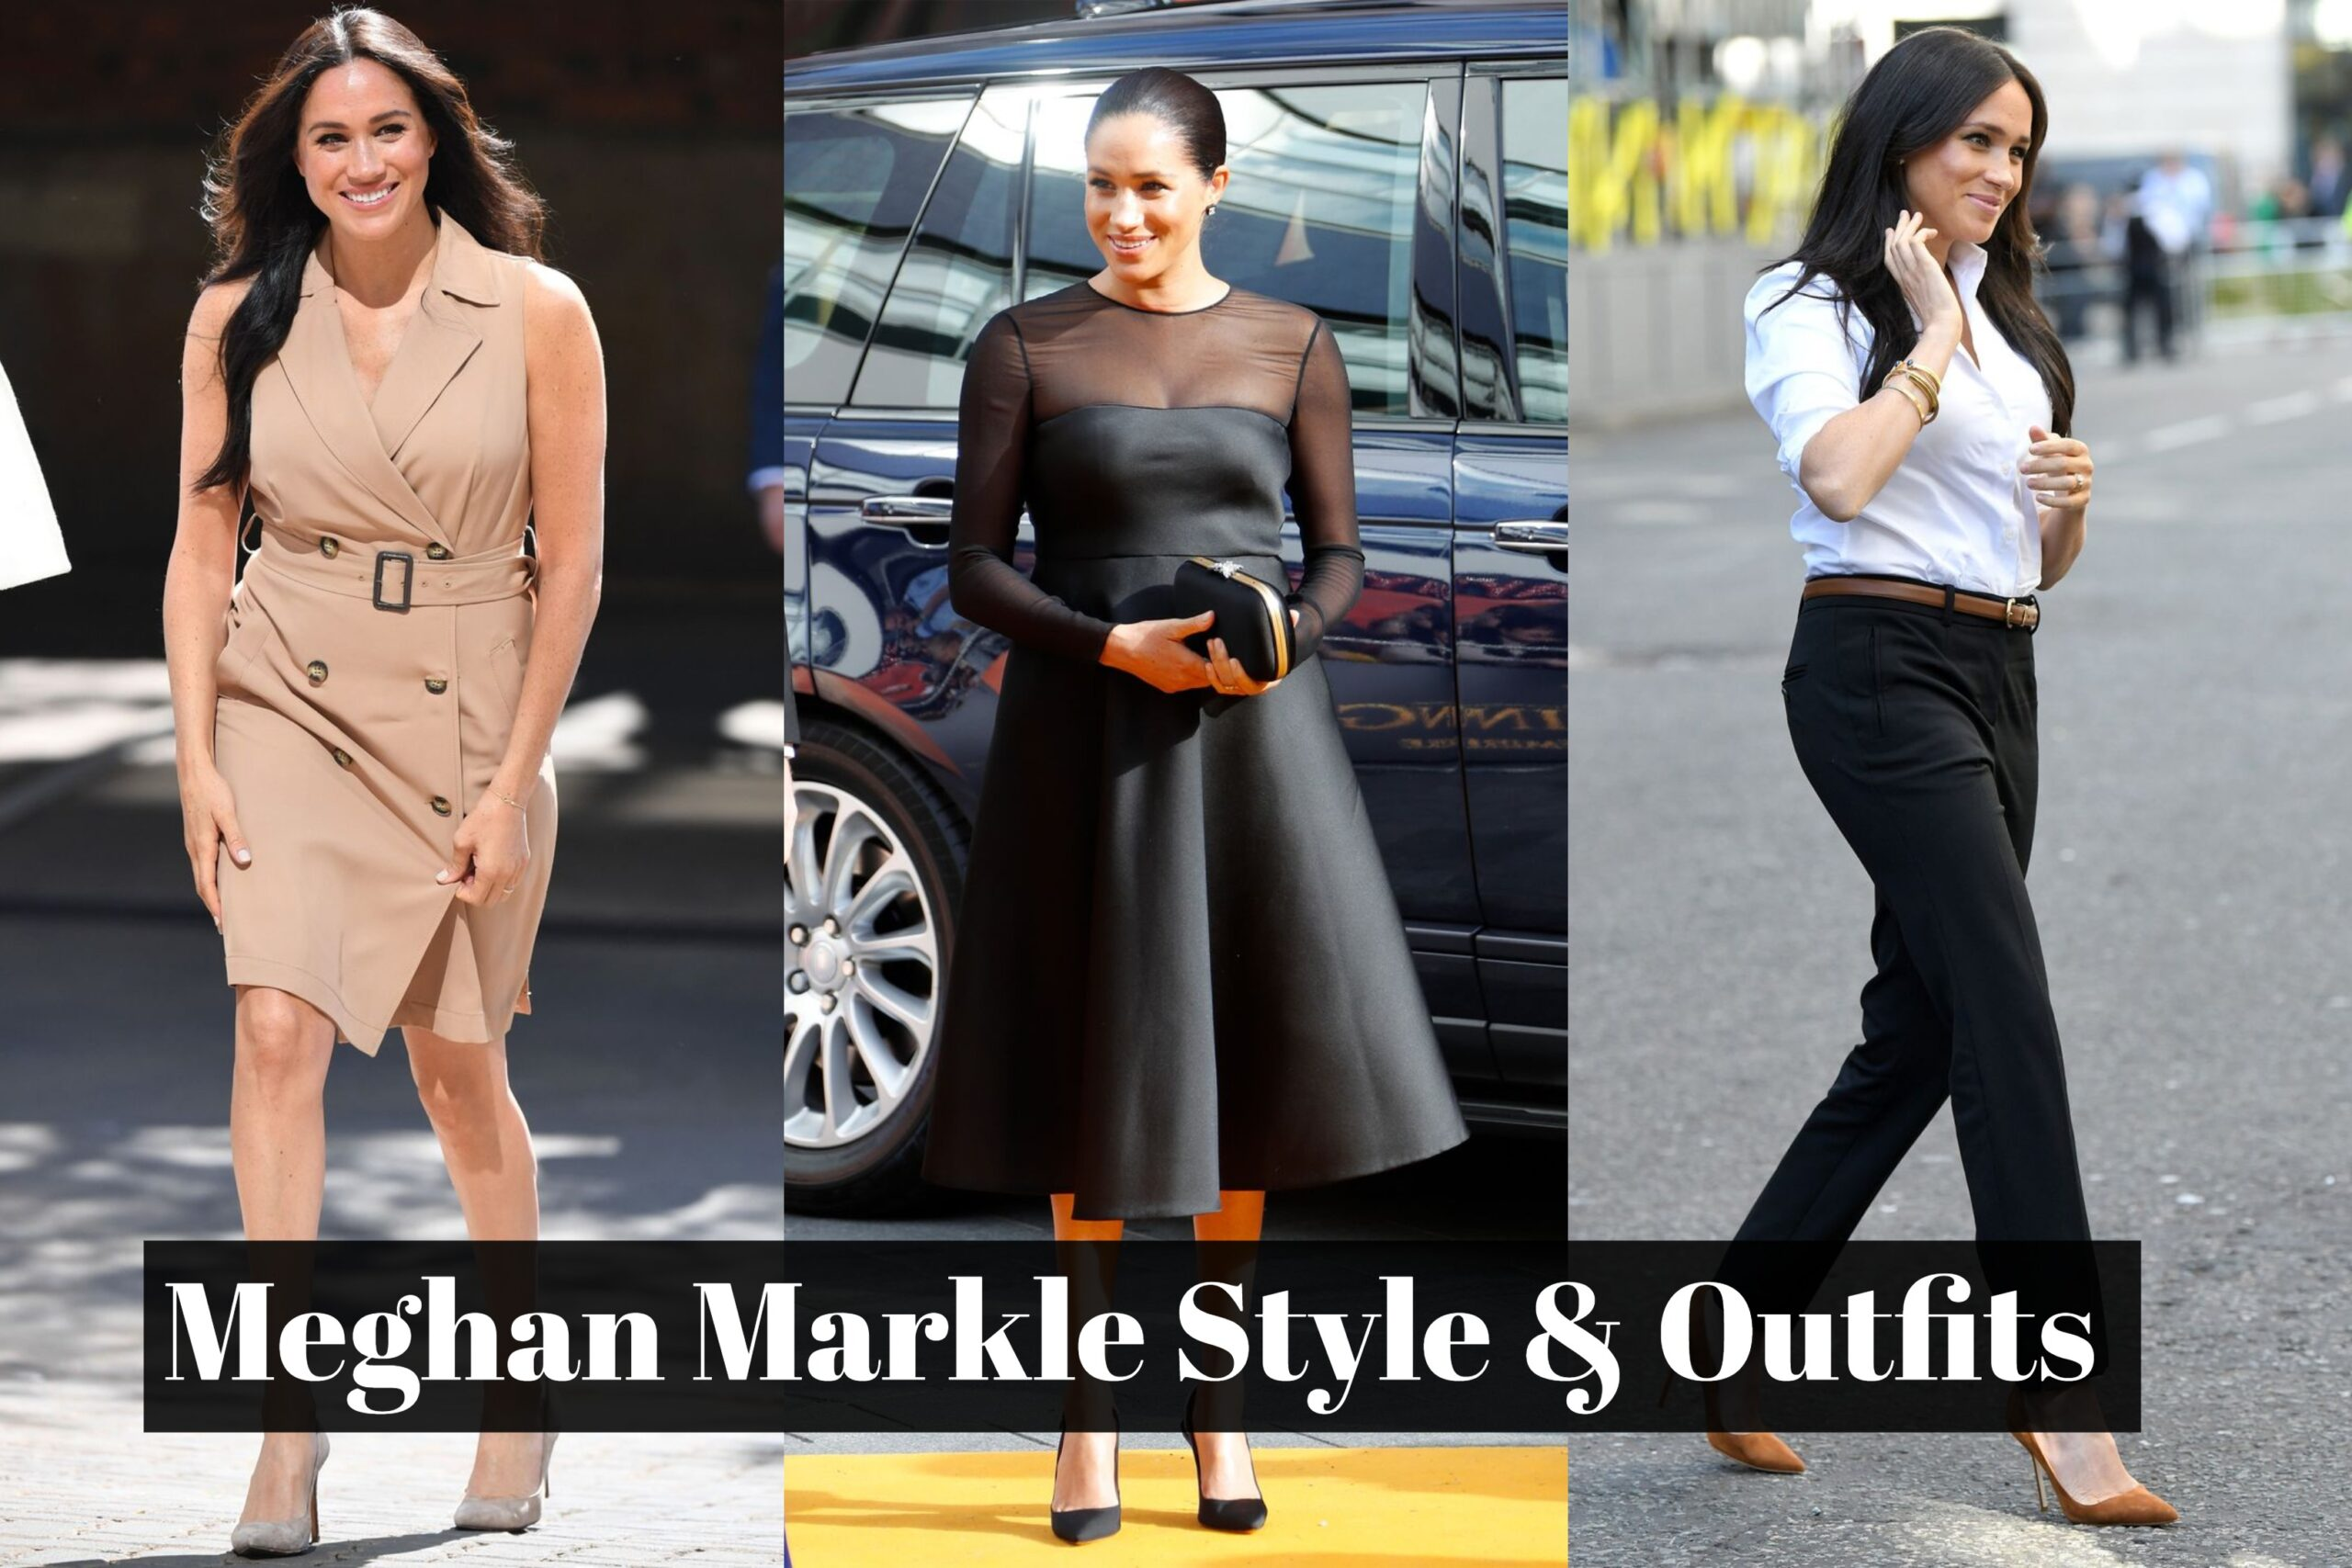 Meghan Markle Style